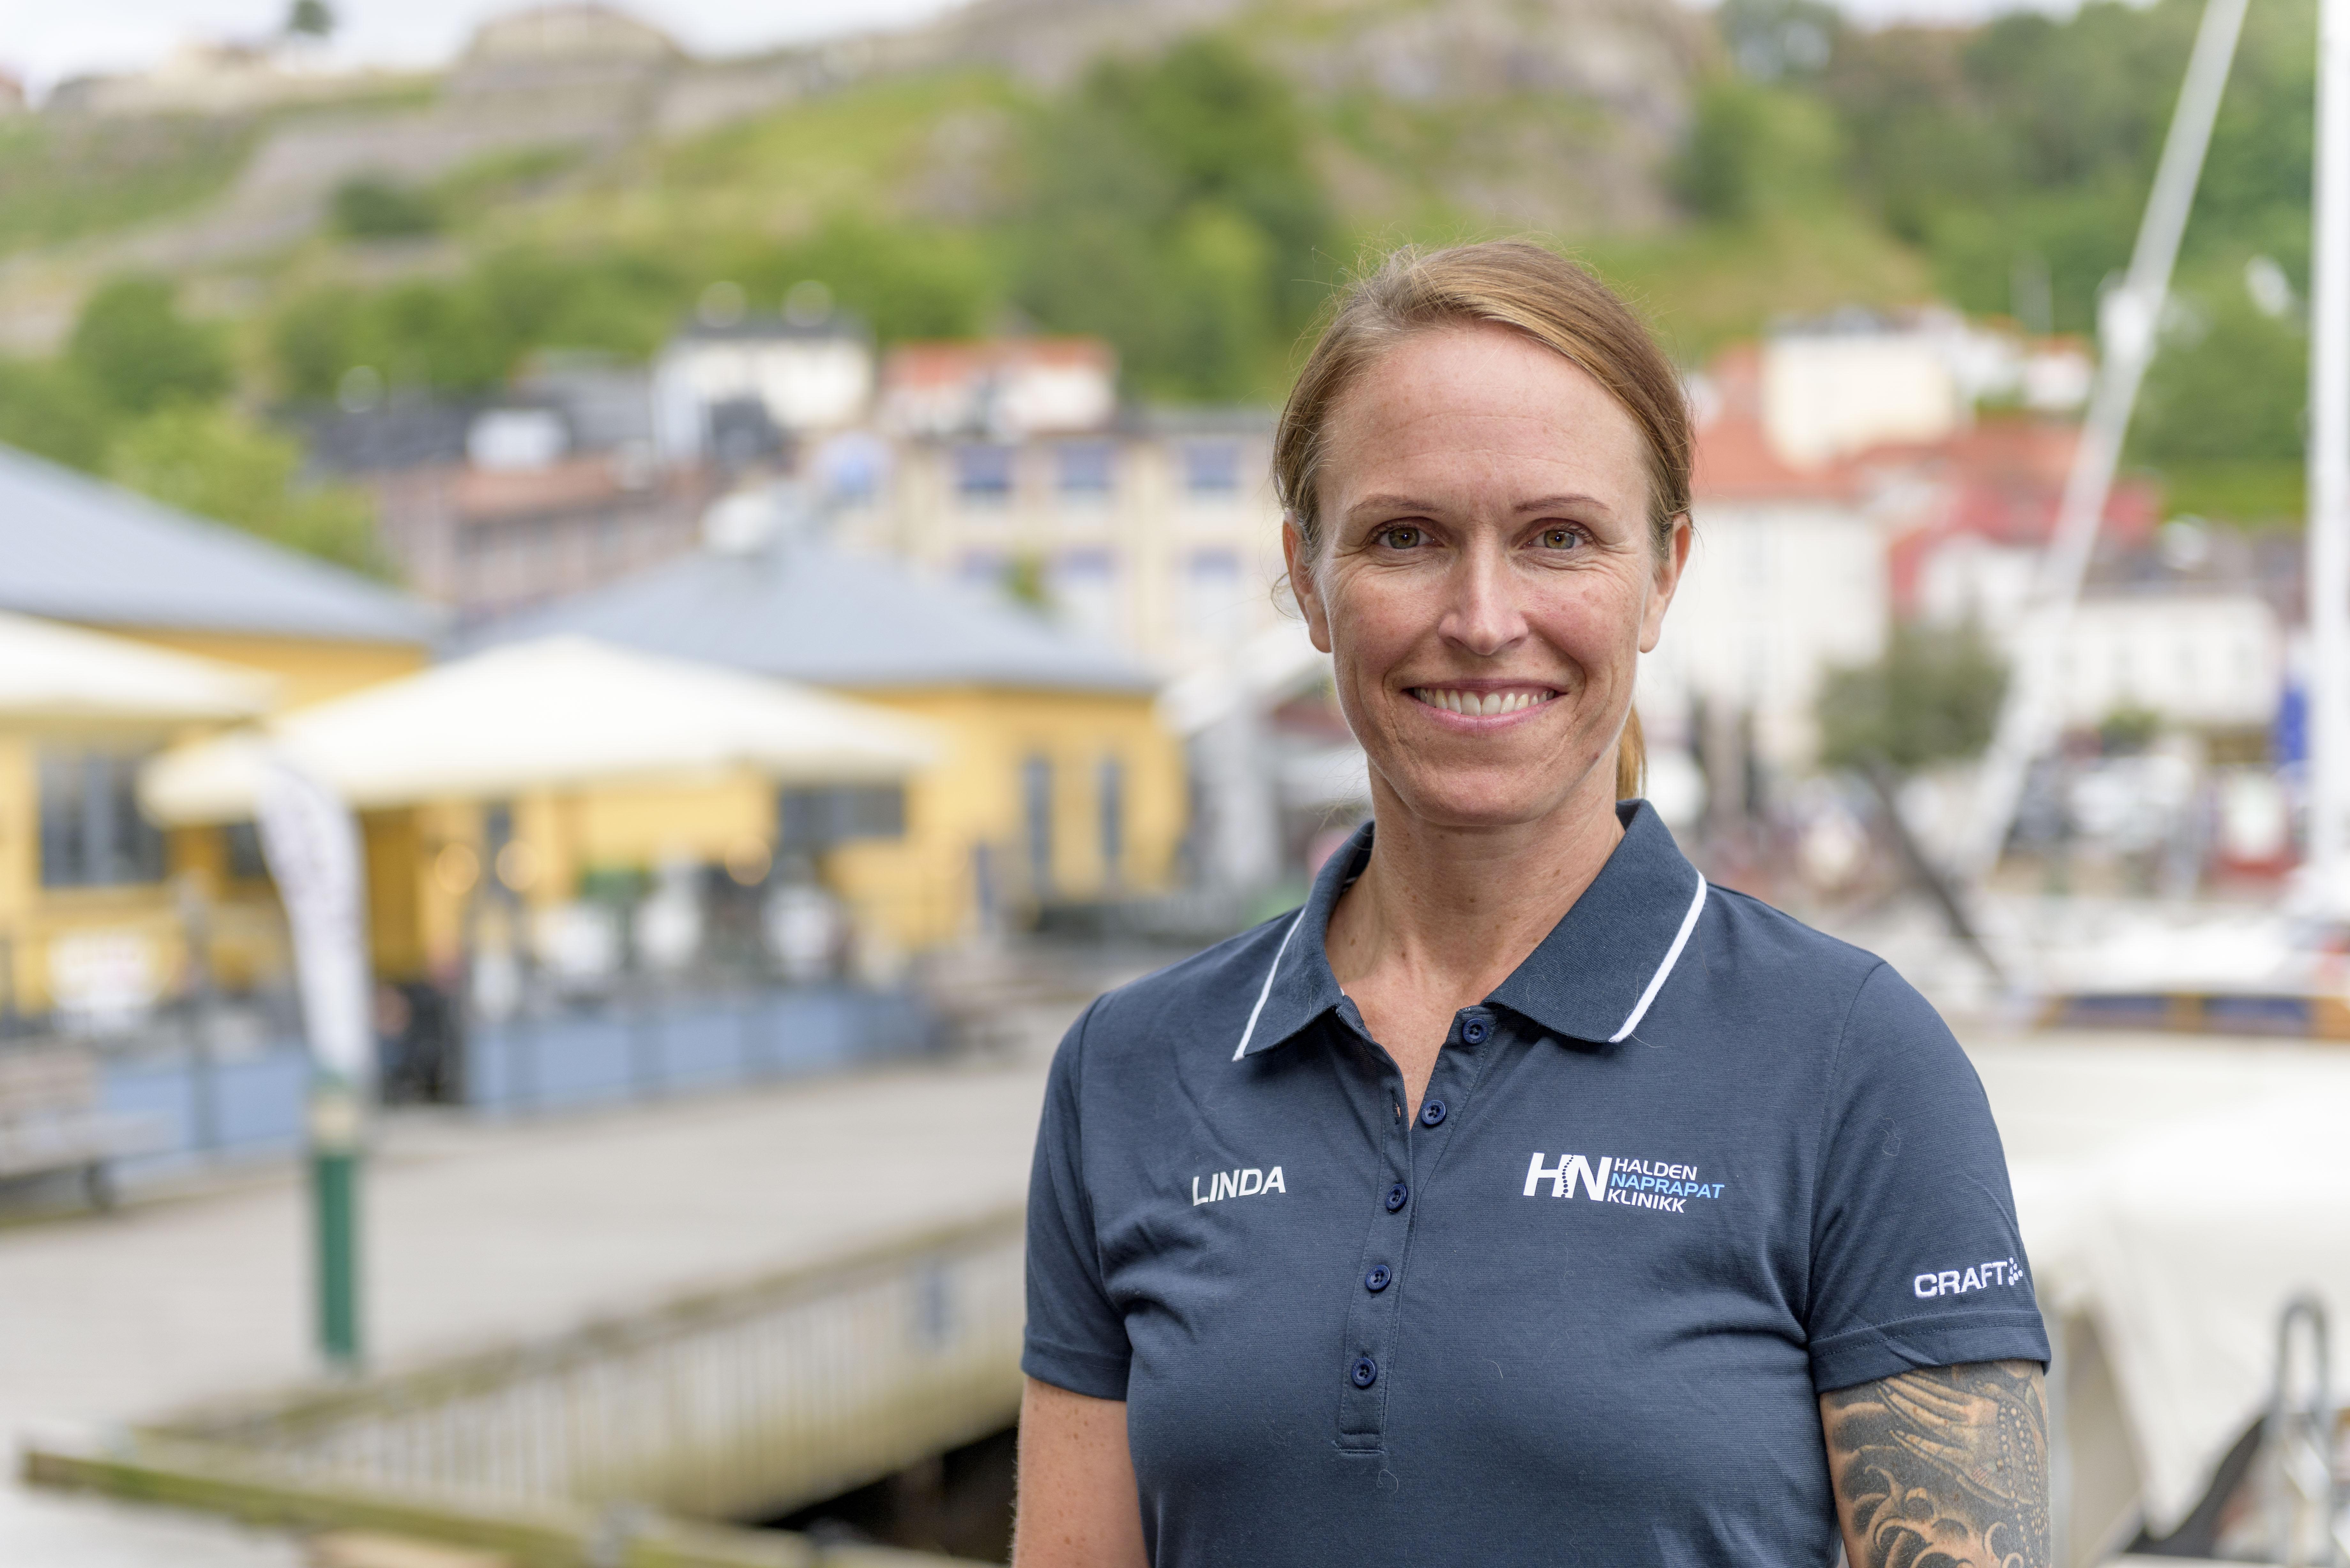 Helfigurbilde av Linda Høgberg